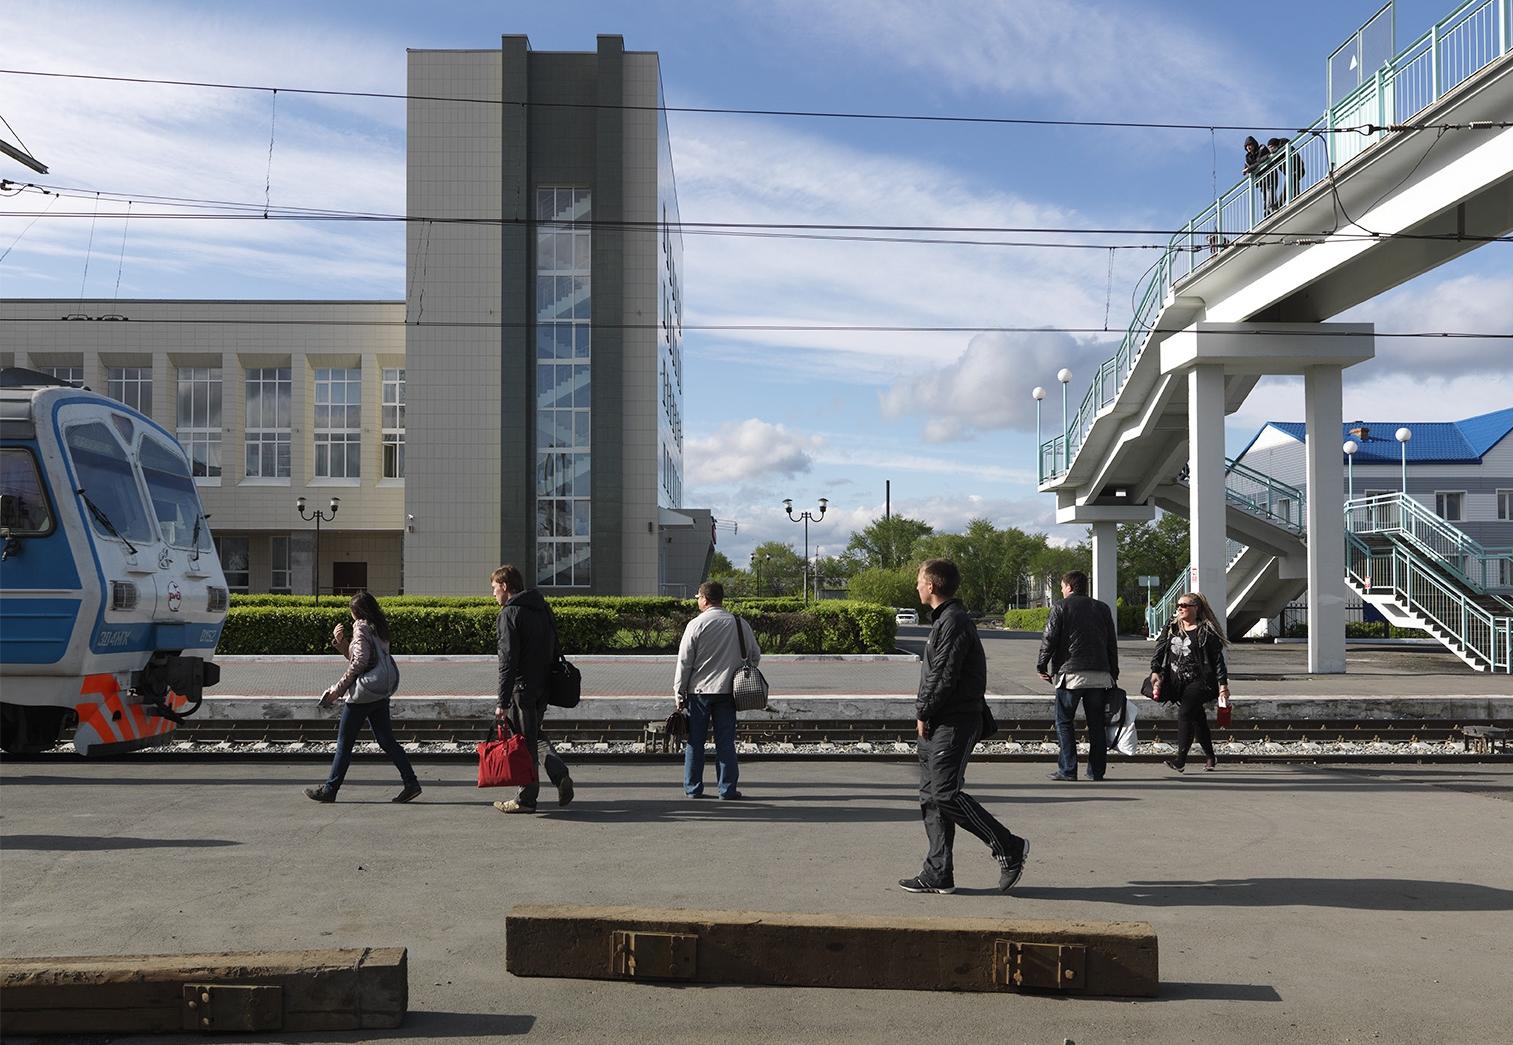 Platform RU-_0421.jpg